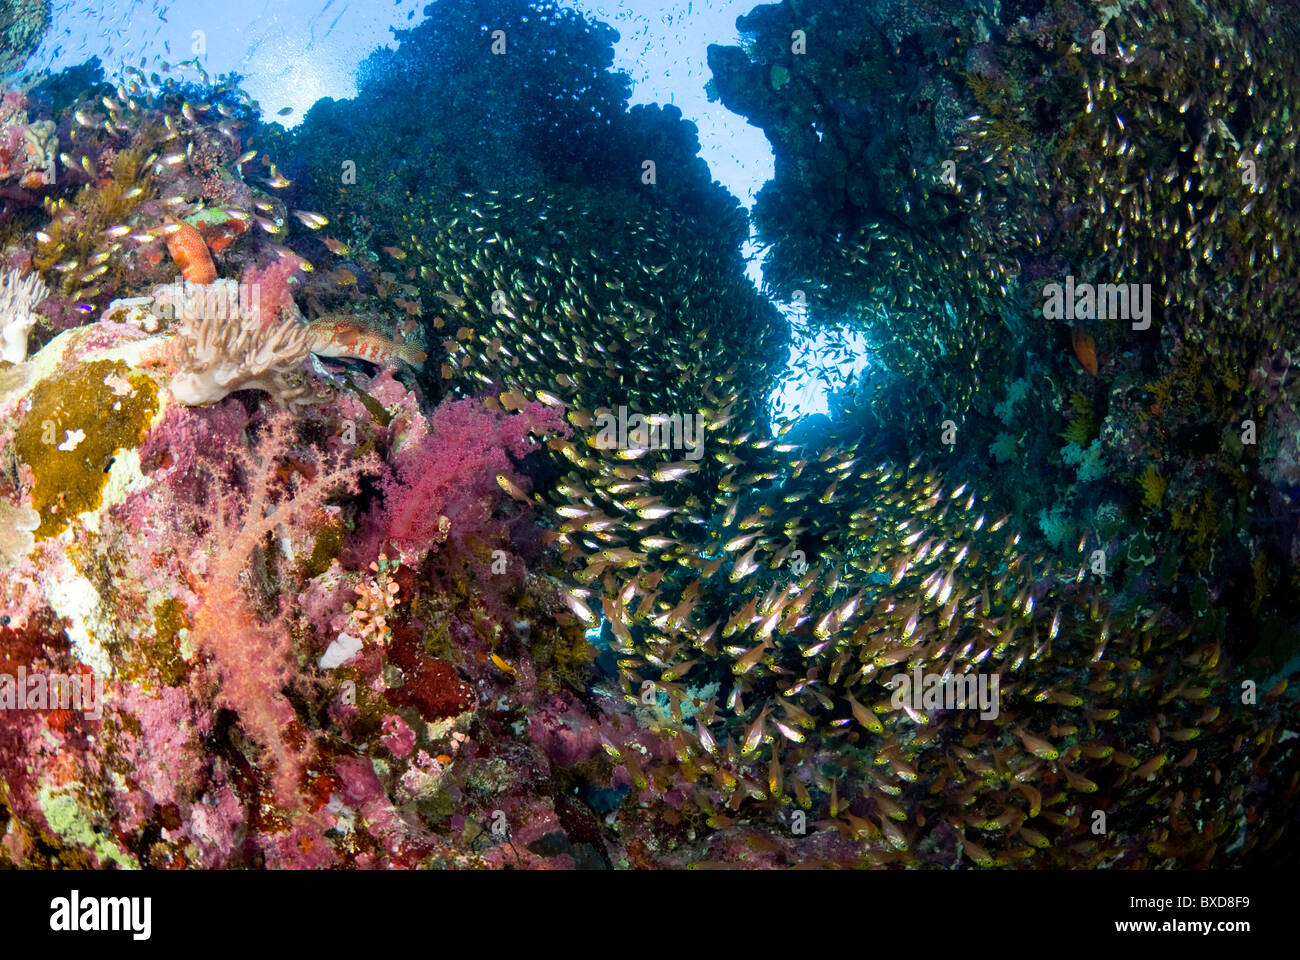 School of glass fish, Ras Zatar, Ras Mohammed, Sinai, Egypt, Red Sea - Stock Image